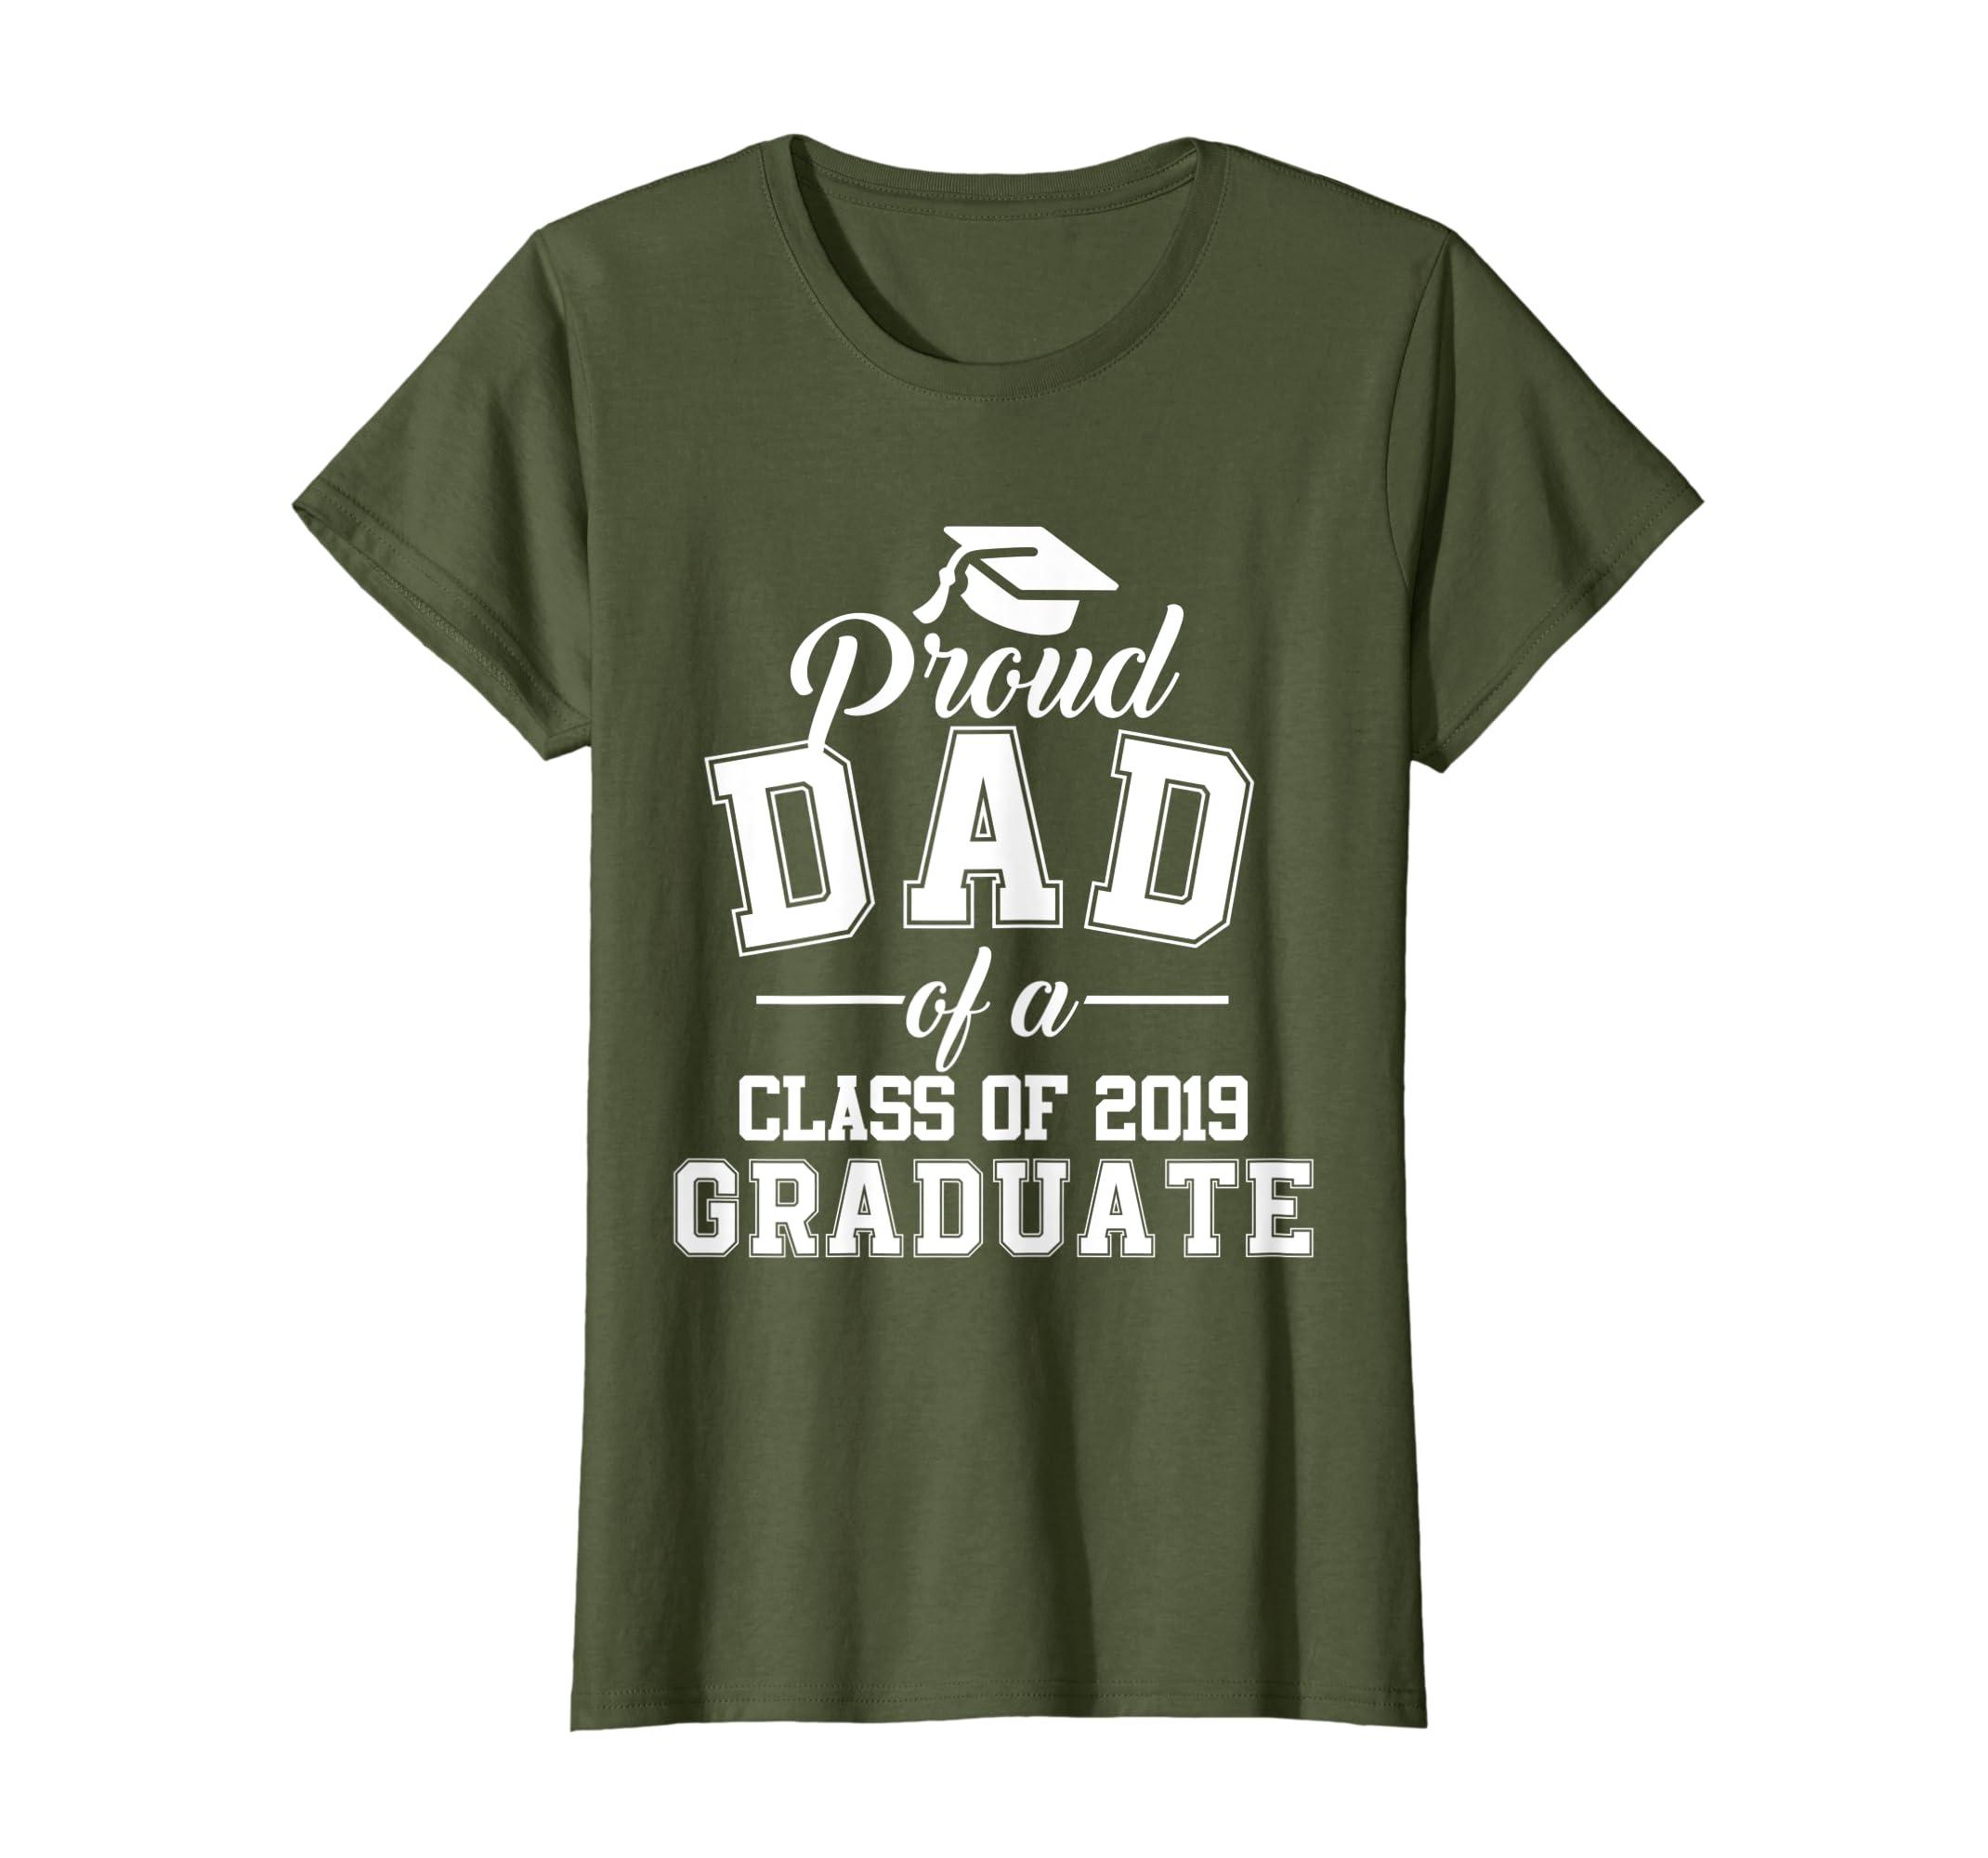 fd84e1d1f Amazon.com: Proud Dad of A Class of 2019 Graduate Graduation T Shirt:  Clothing